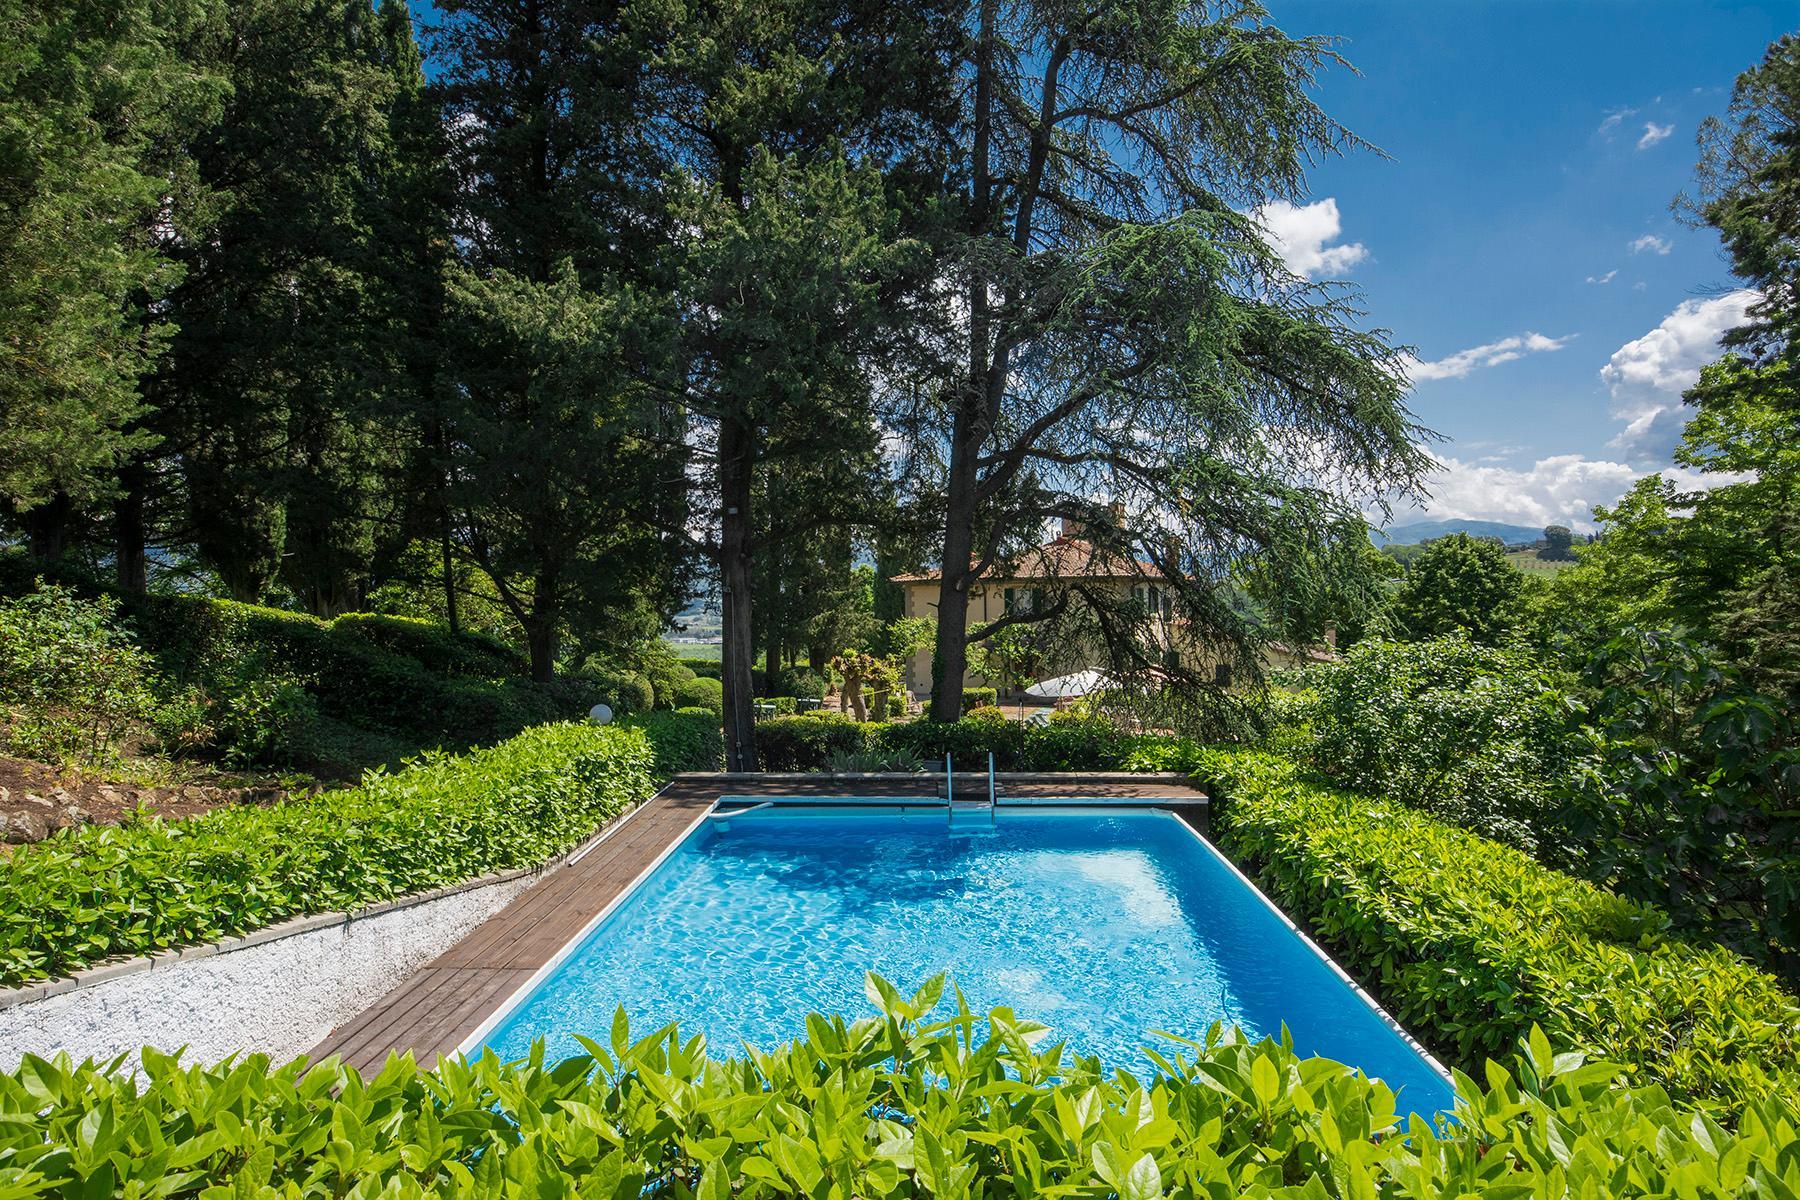 Villa charmante dans dans la Val di Sieve - 6